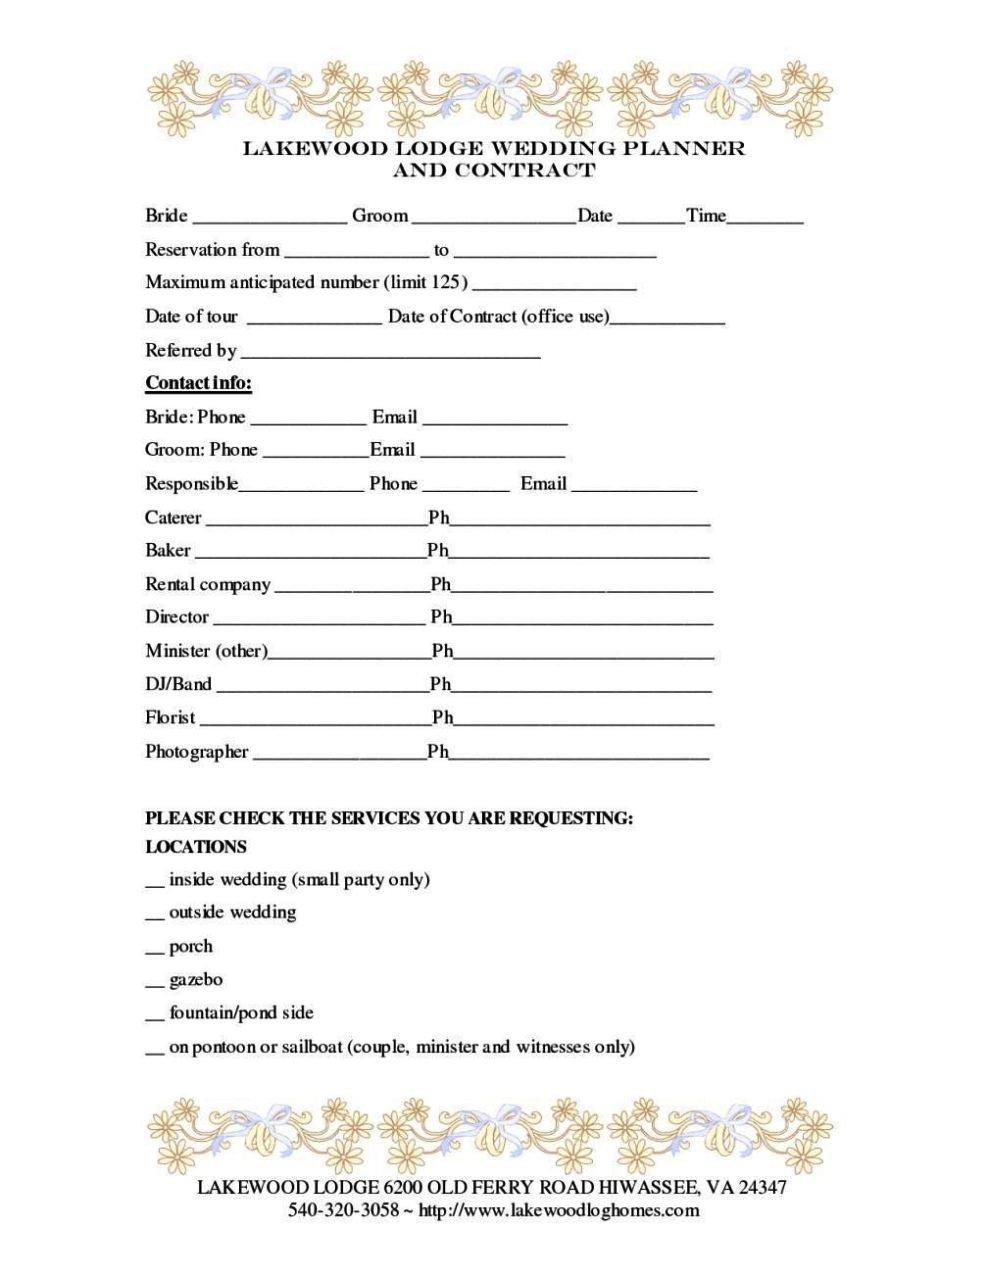 Wedding Florist Contract Template Wedding Florist Contract Template Sampletemplatess